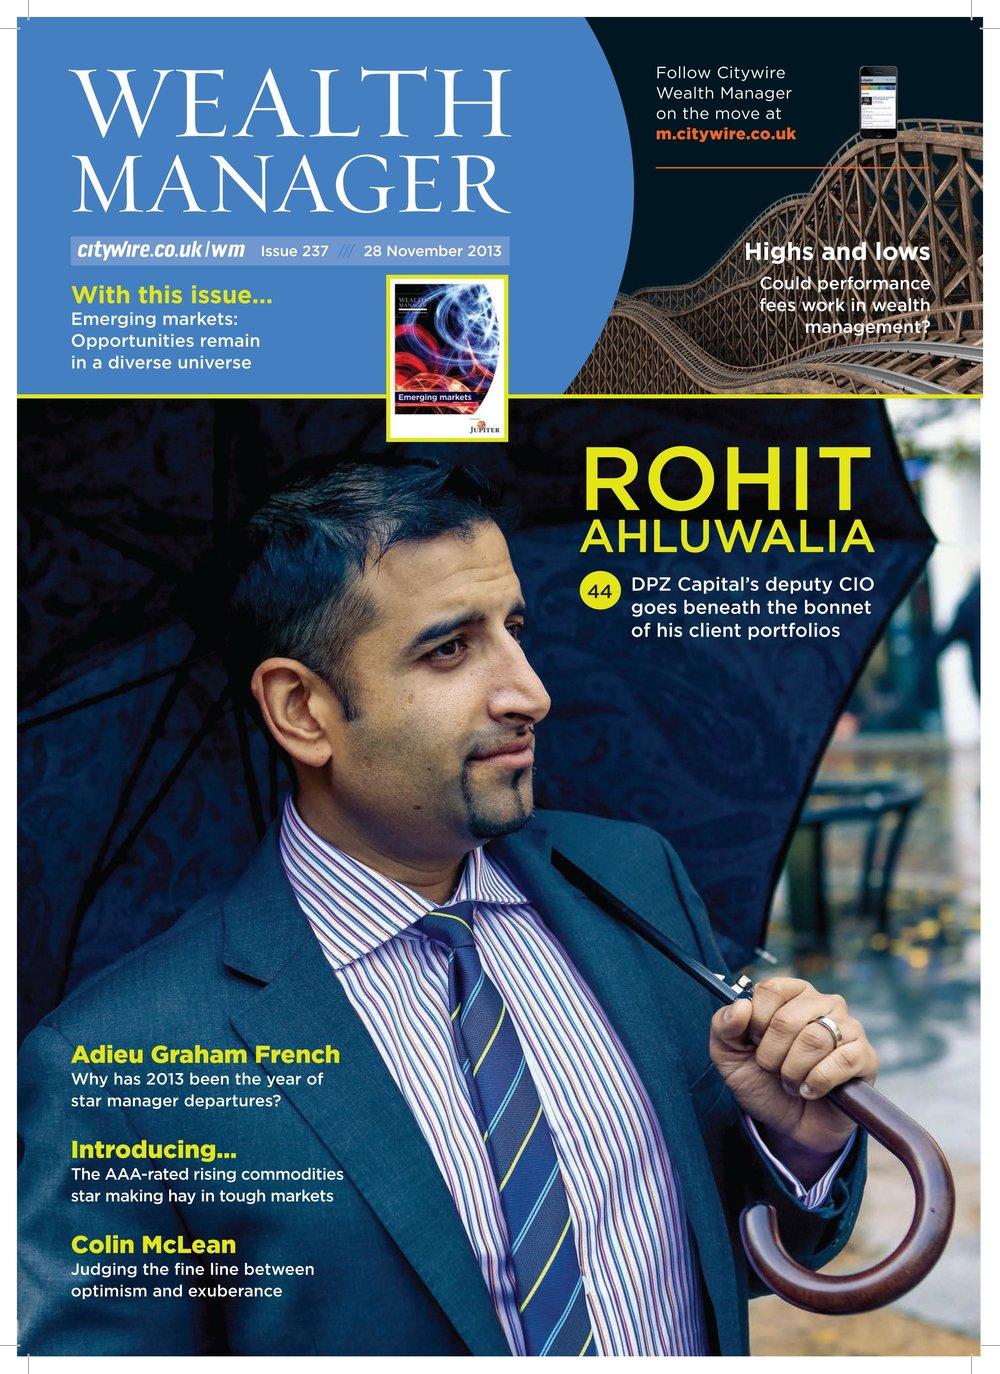 WM 237 Rohit Ahluwalia-1.jpg